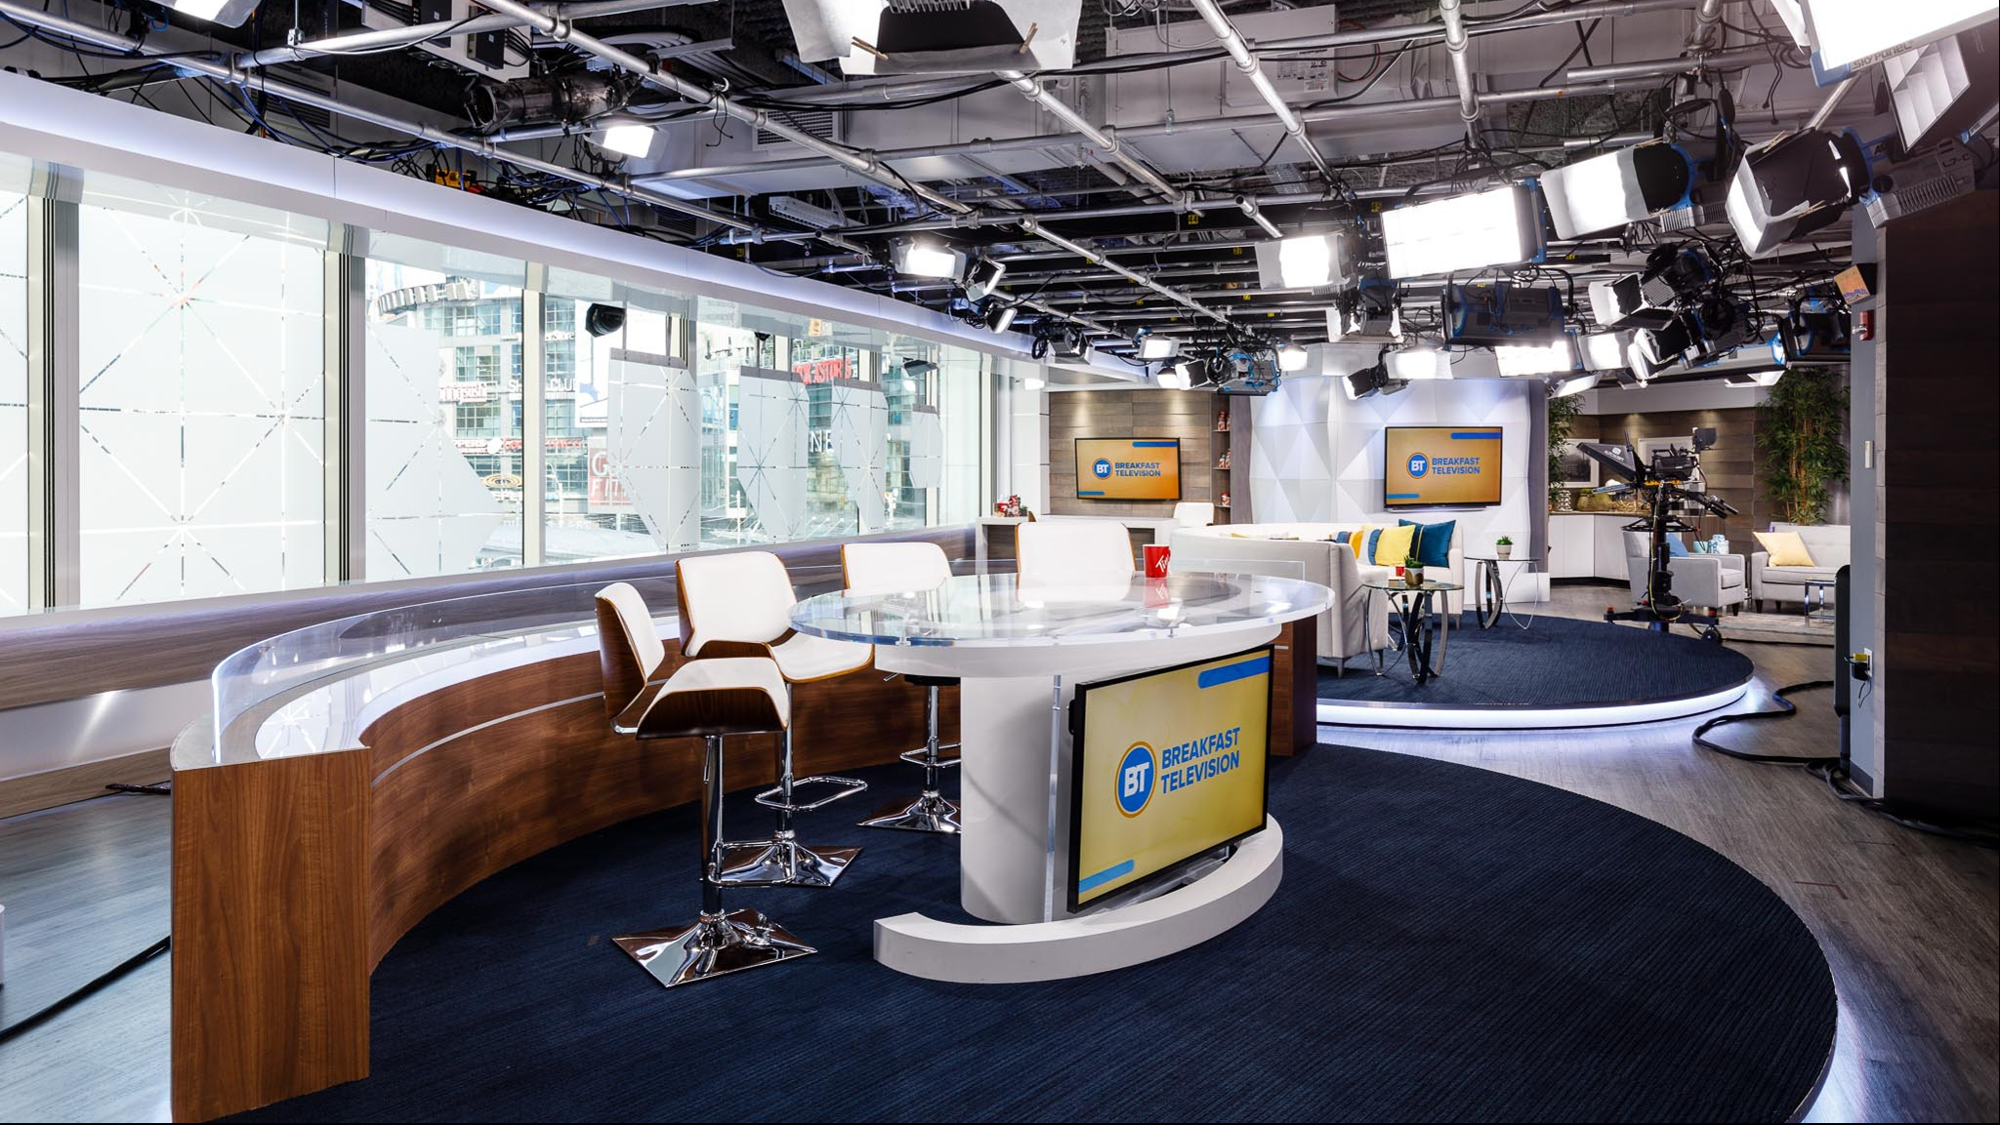 ncs_bt-breakfast-television-canada-tv-studio_0004